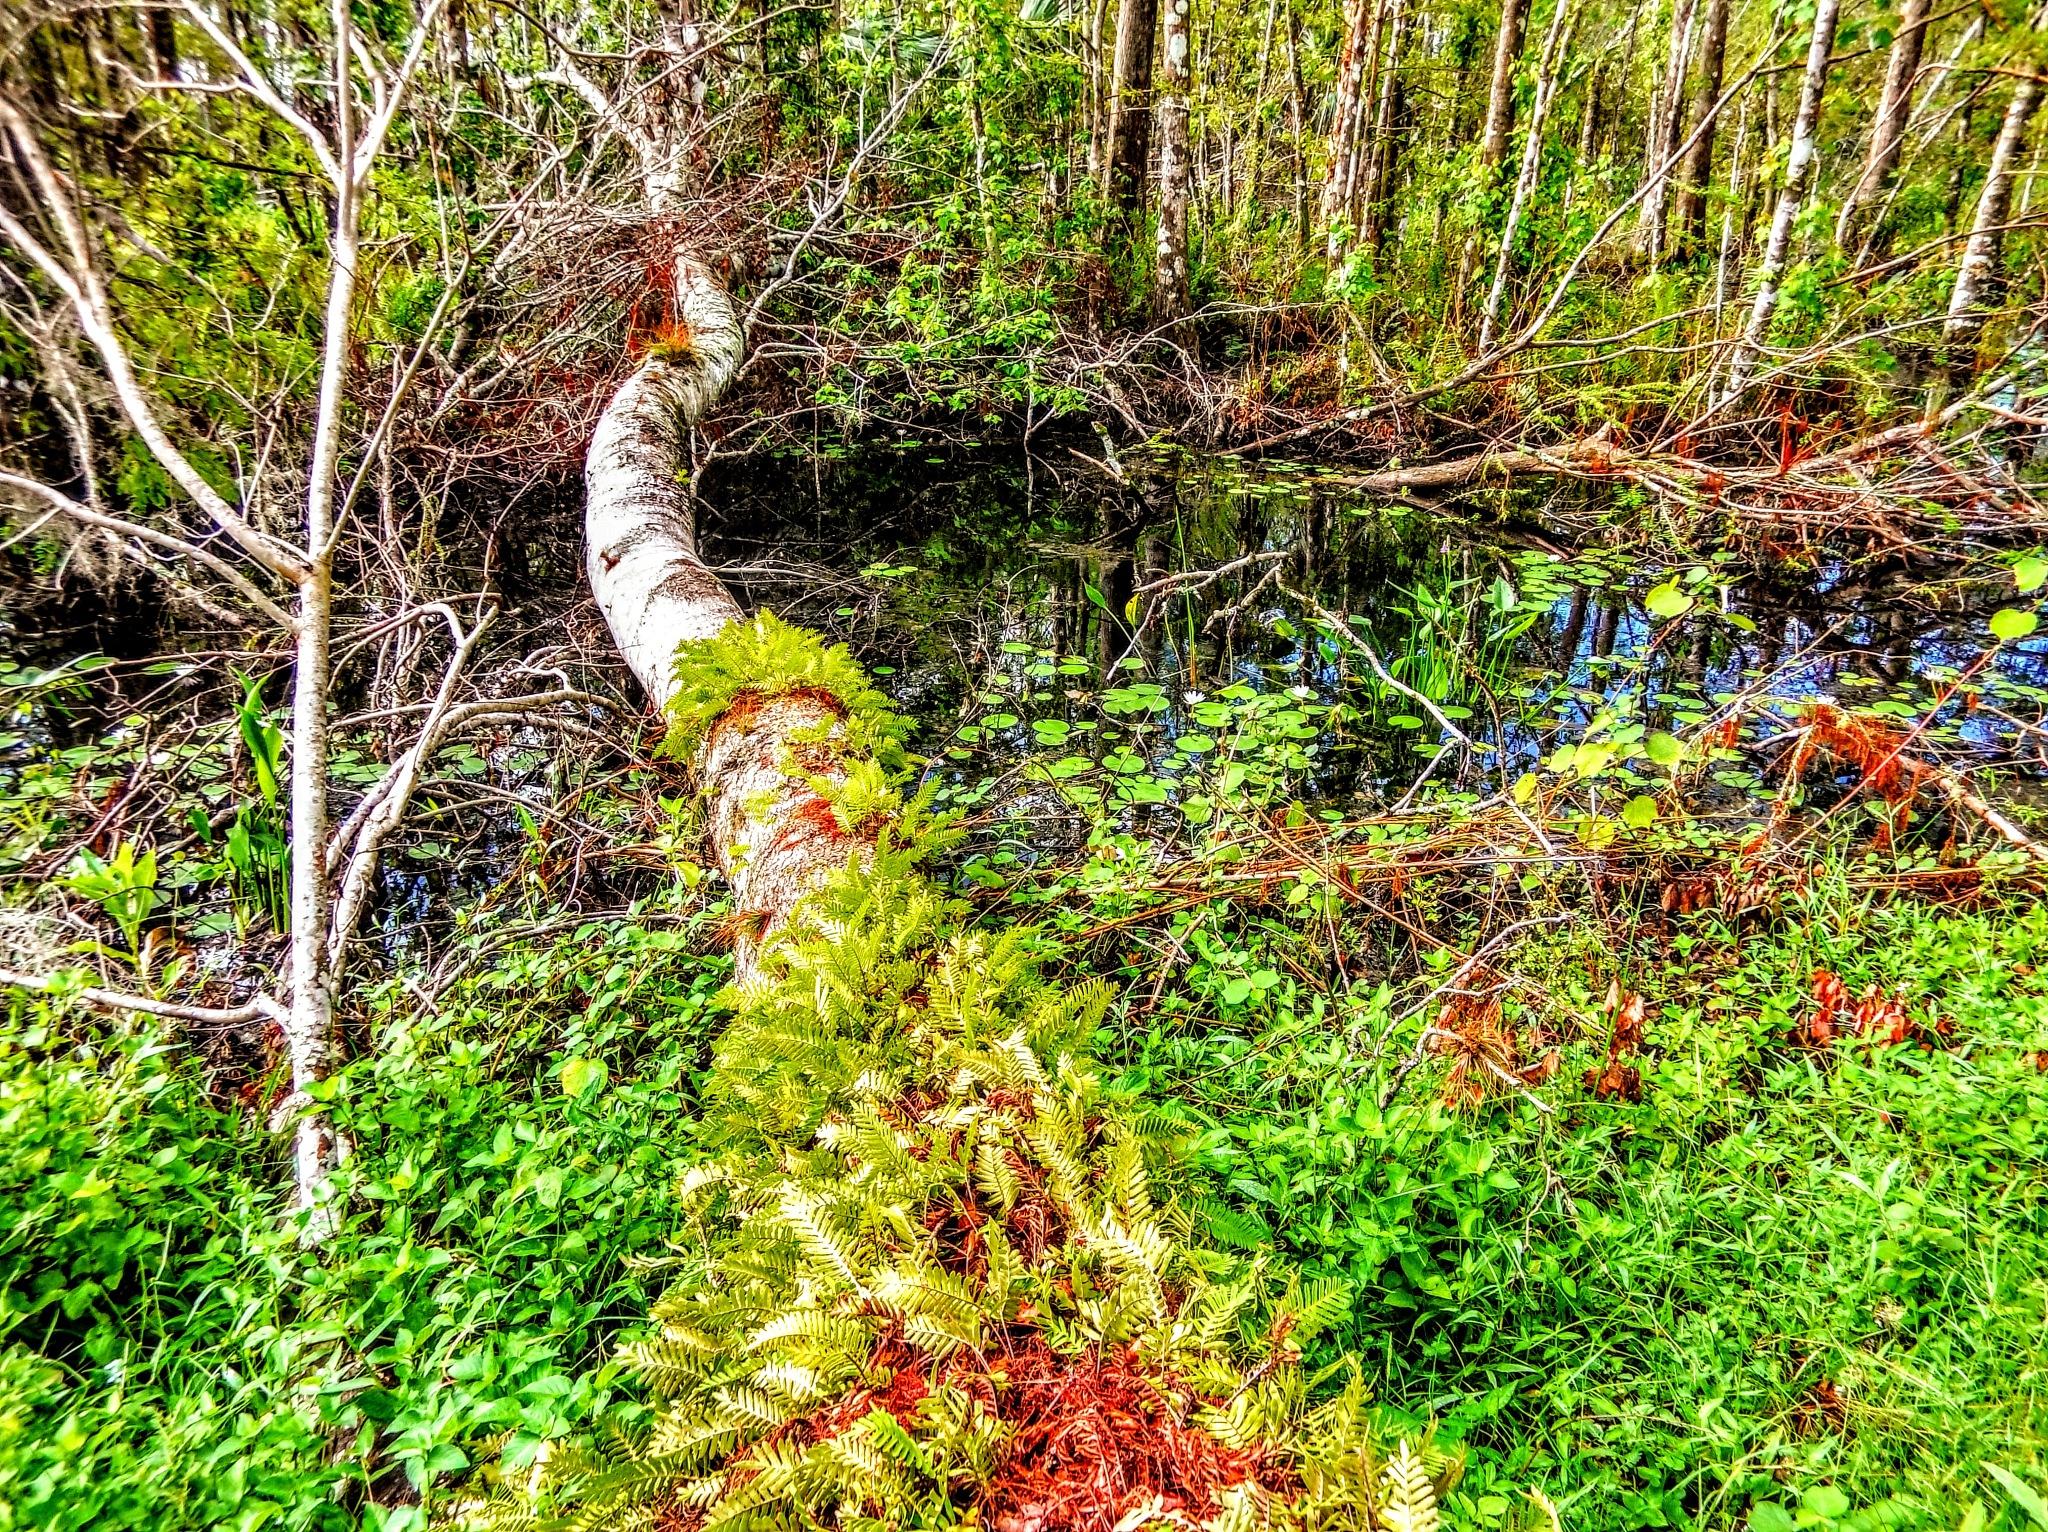 Fallen Ferns by Todd